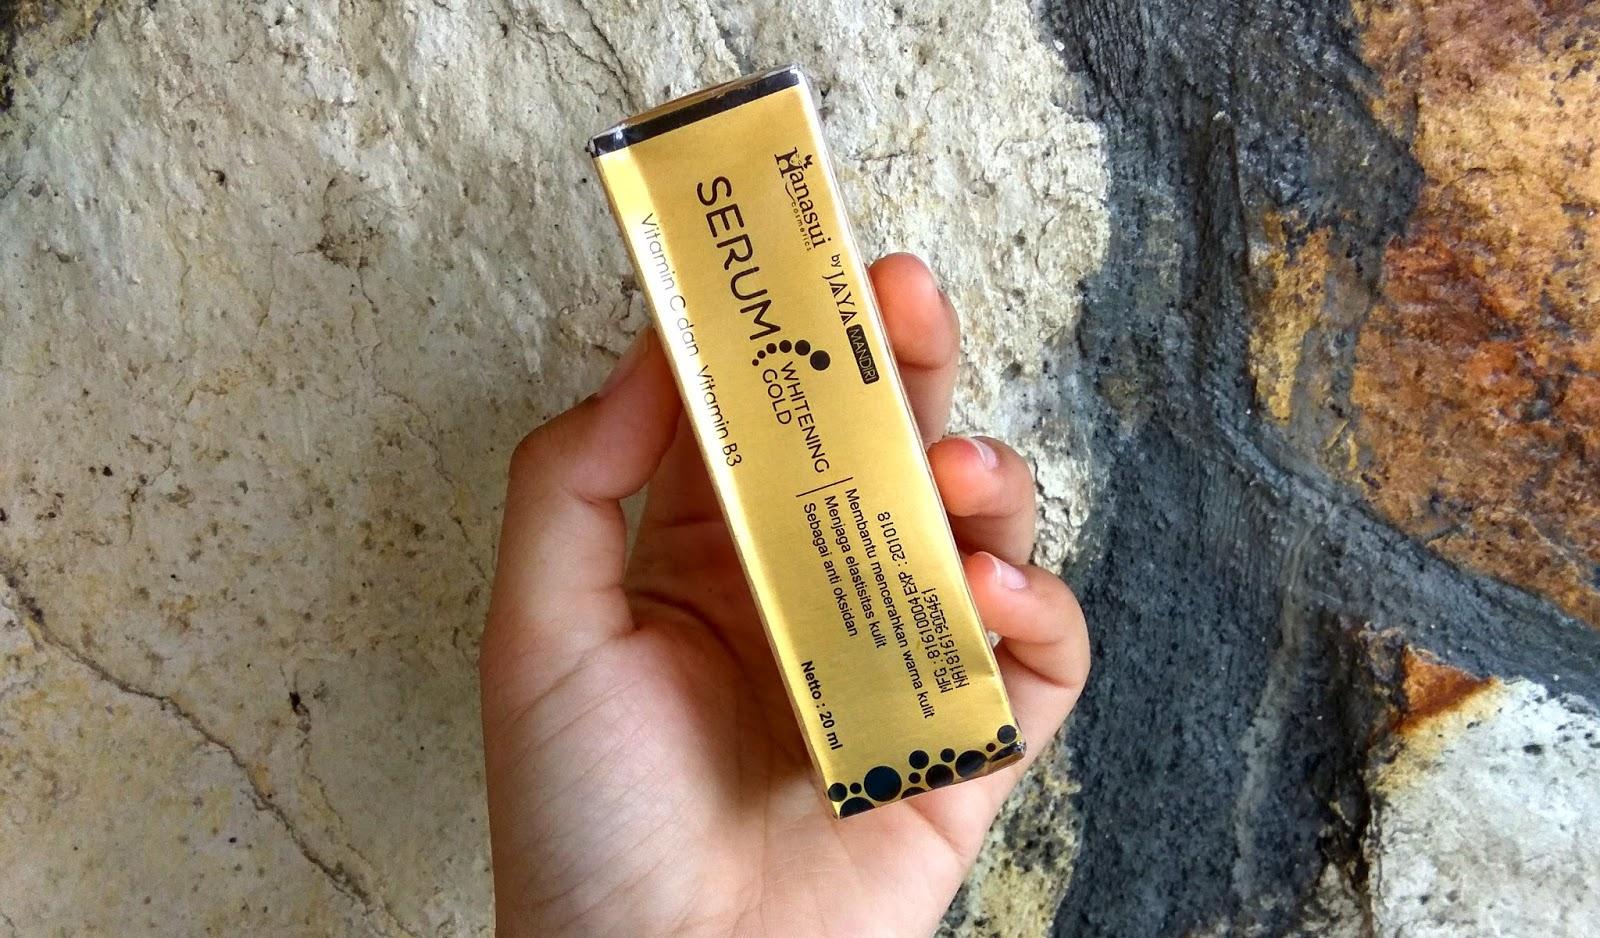 Foto Produk Beauty Queen Malang Album Serum Dan Toner Hanasui Gold Bpom Original Whitening Jaya Mandiri